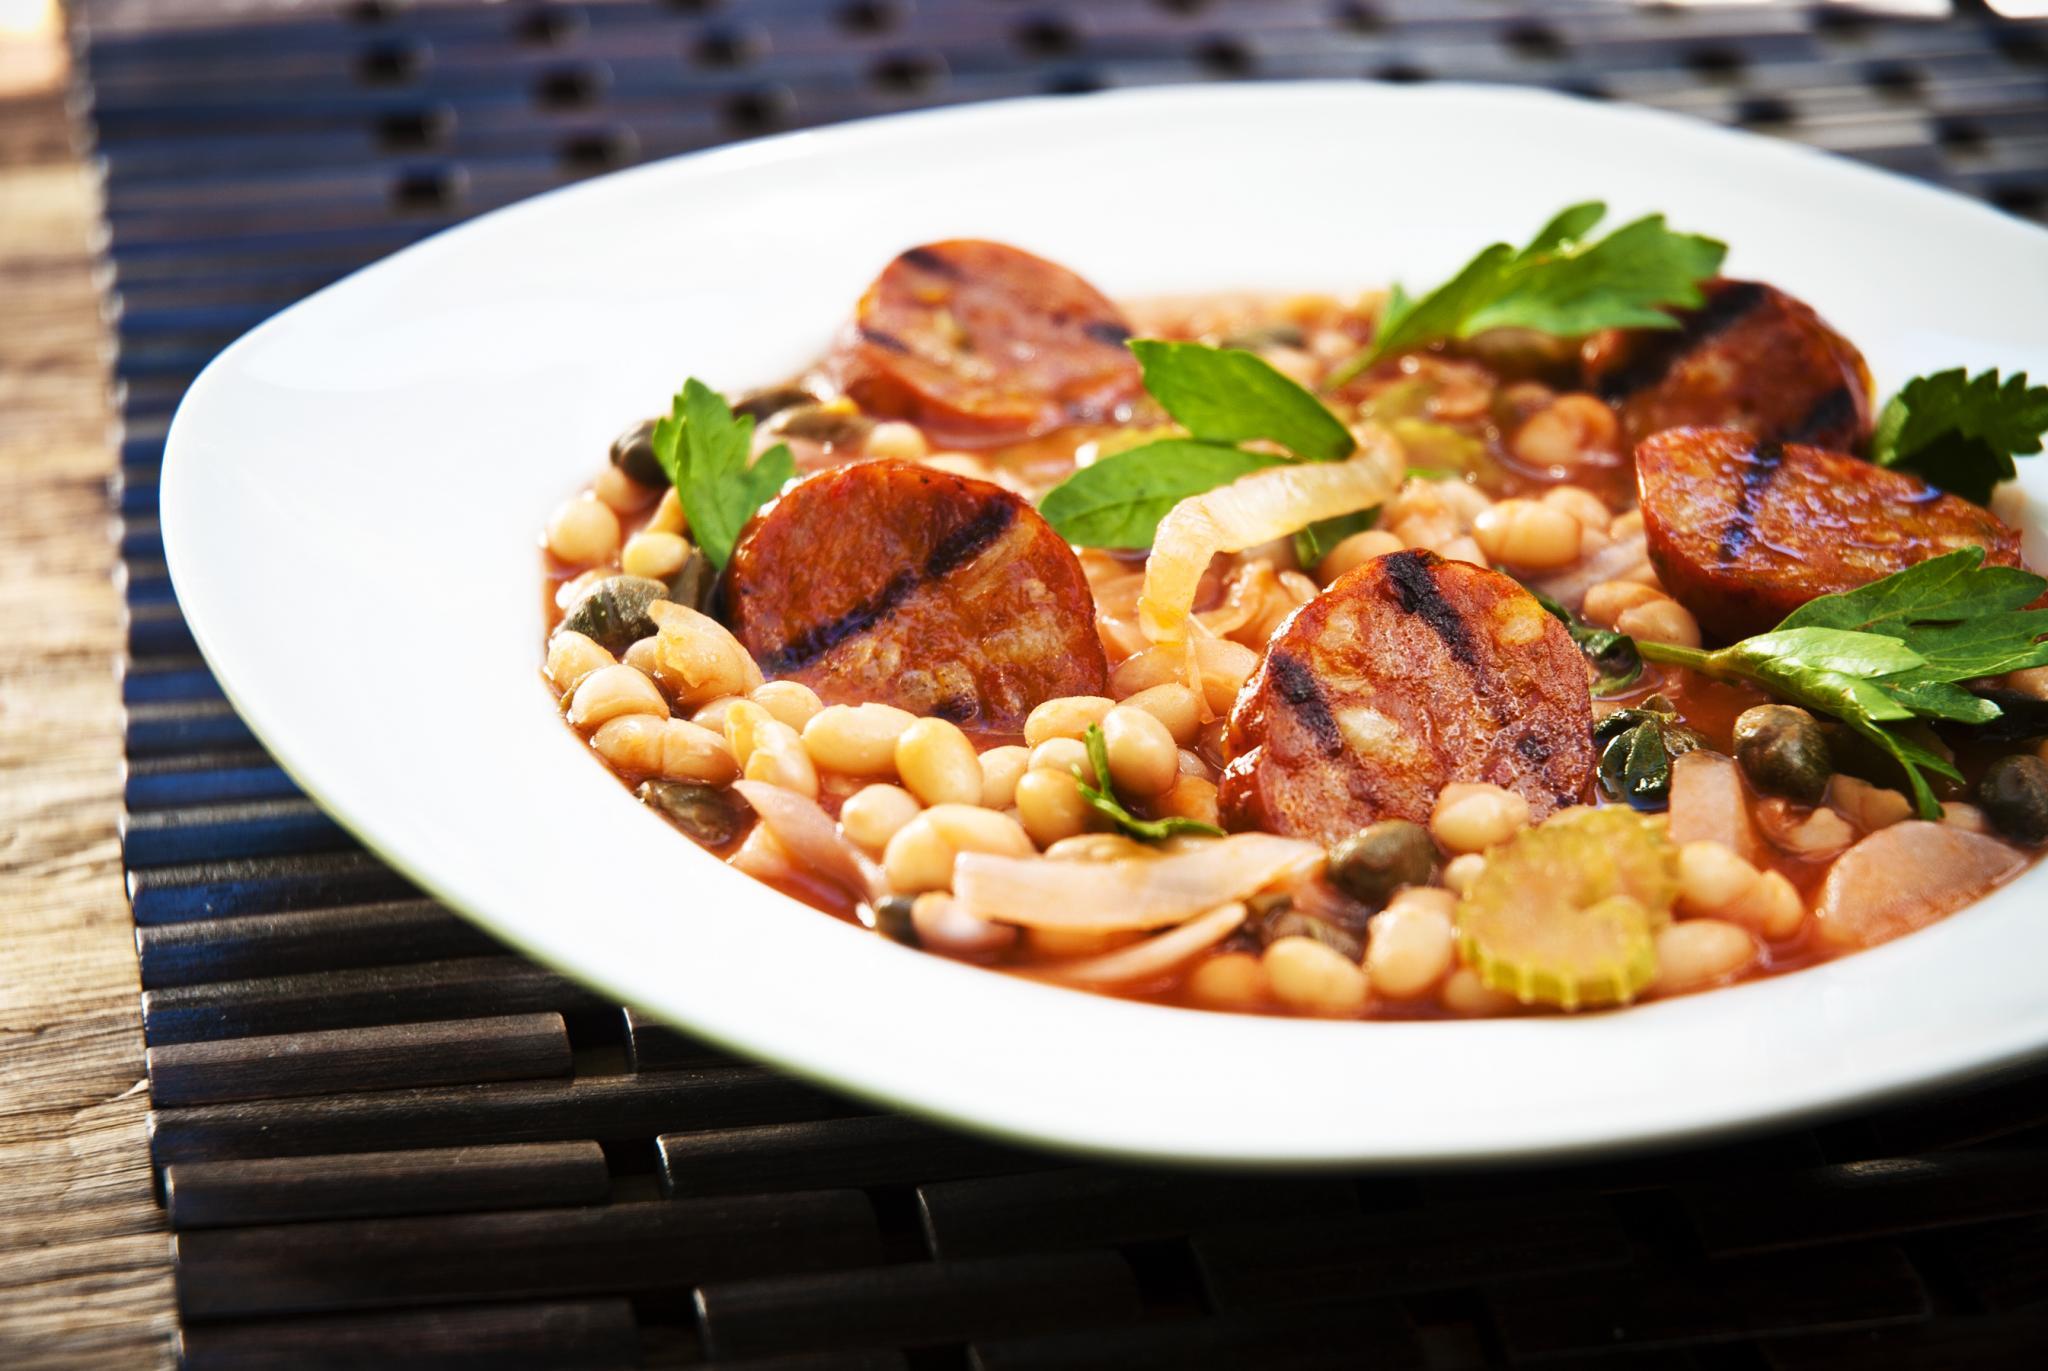 #EssenceEats: Comfort Foods for a Festive Eve